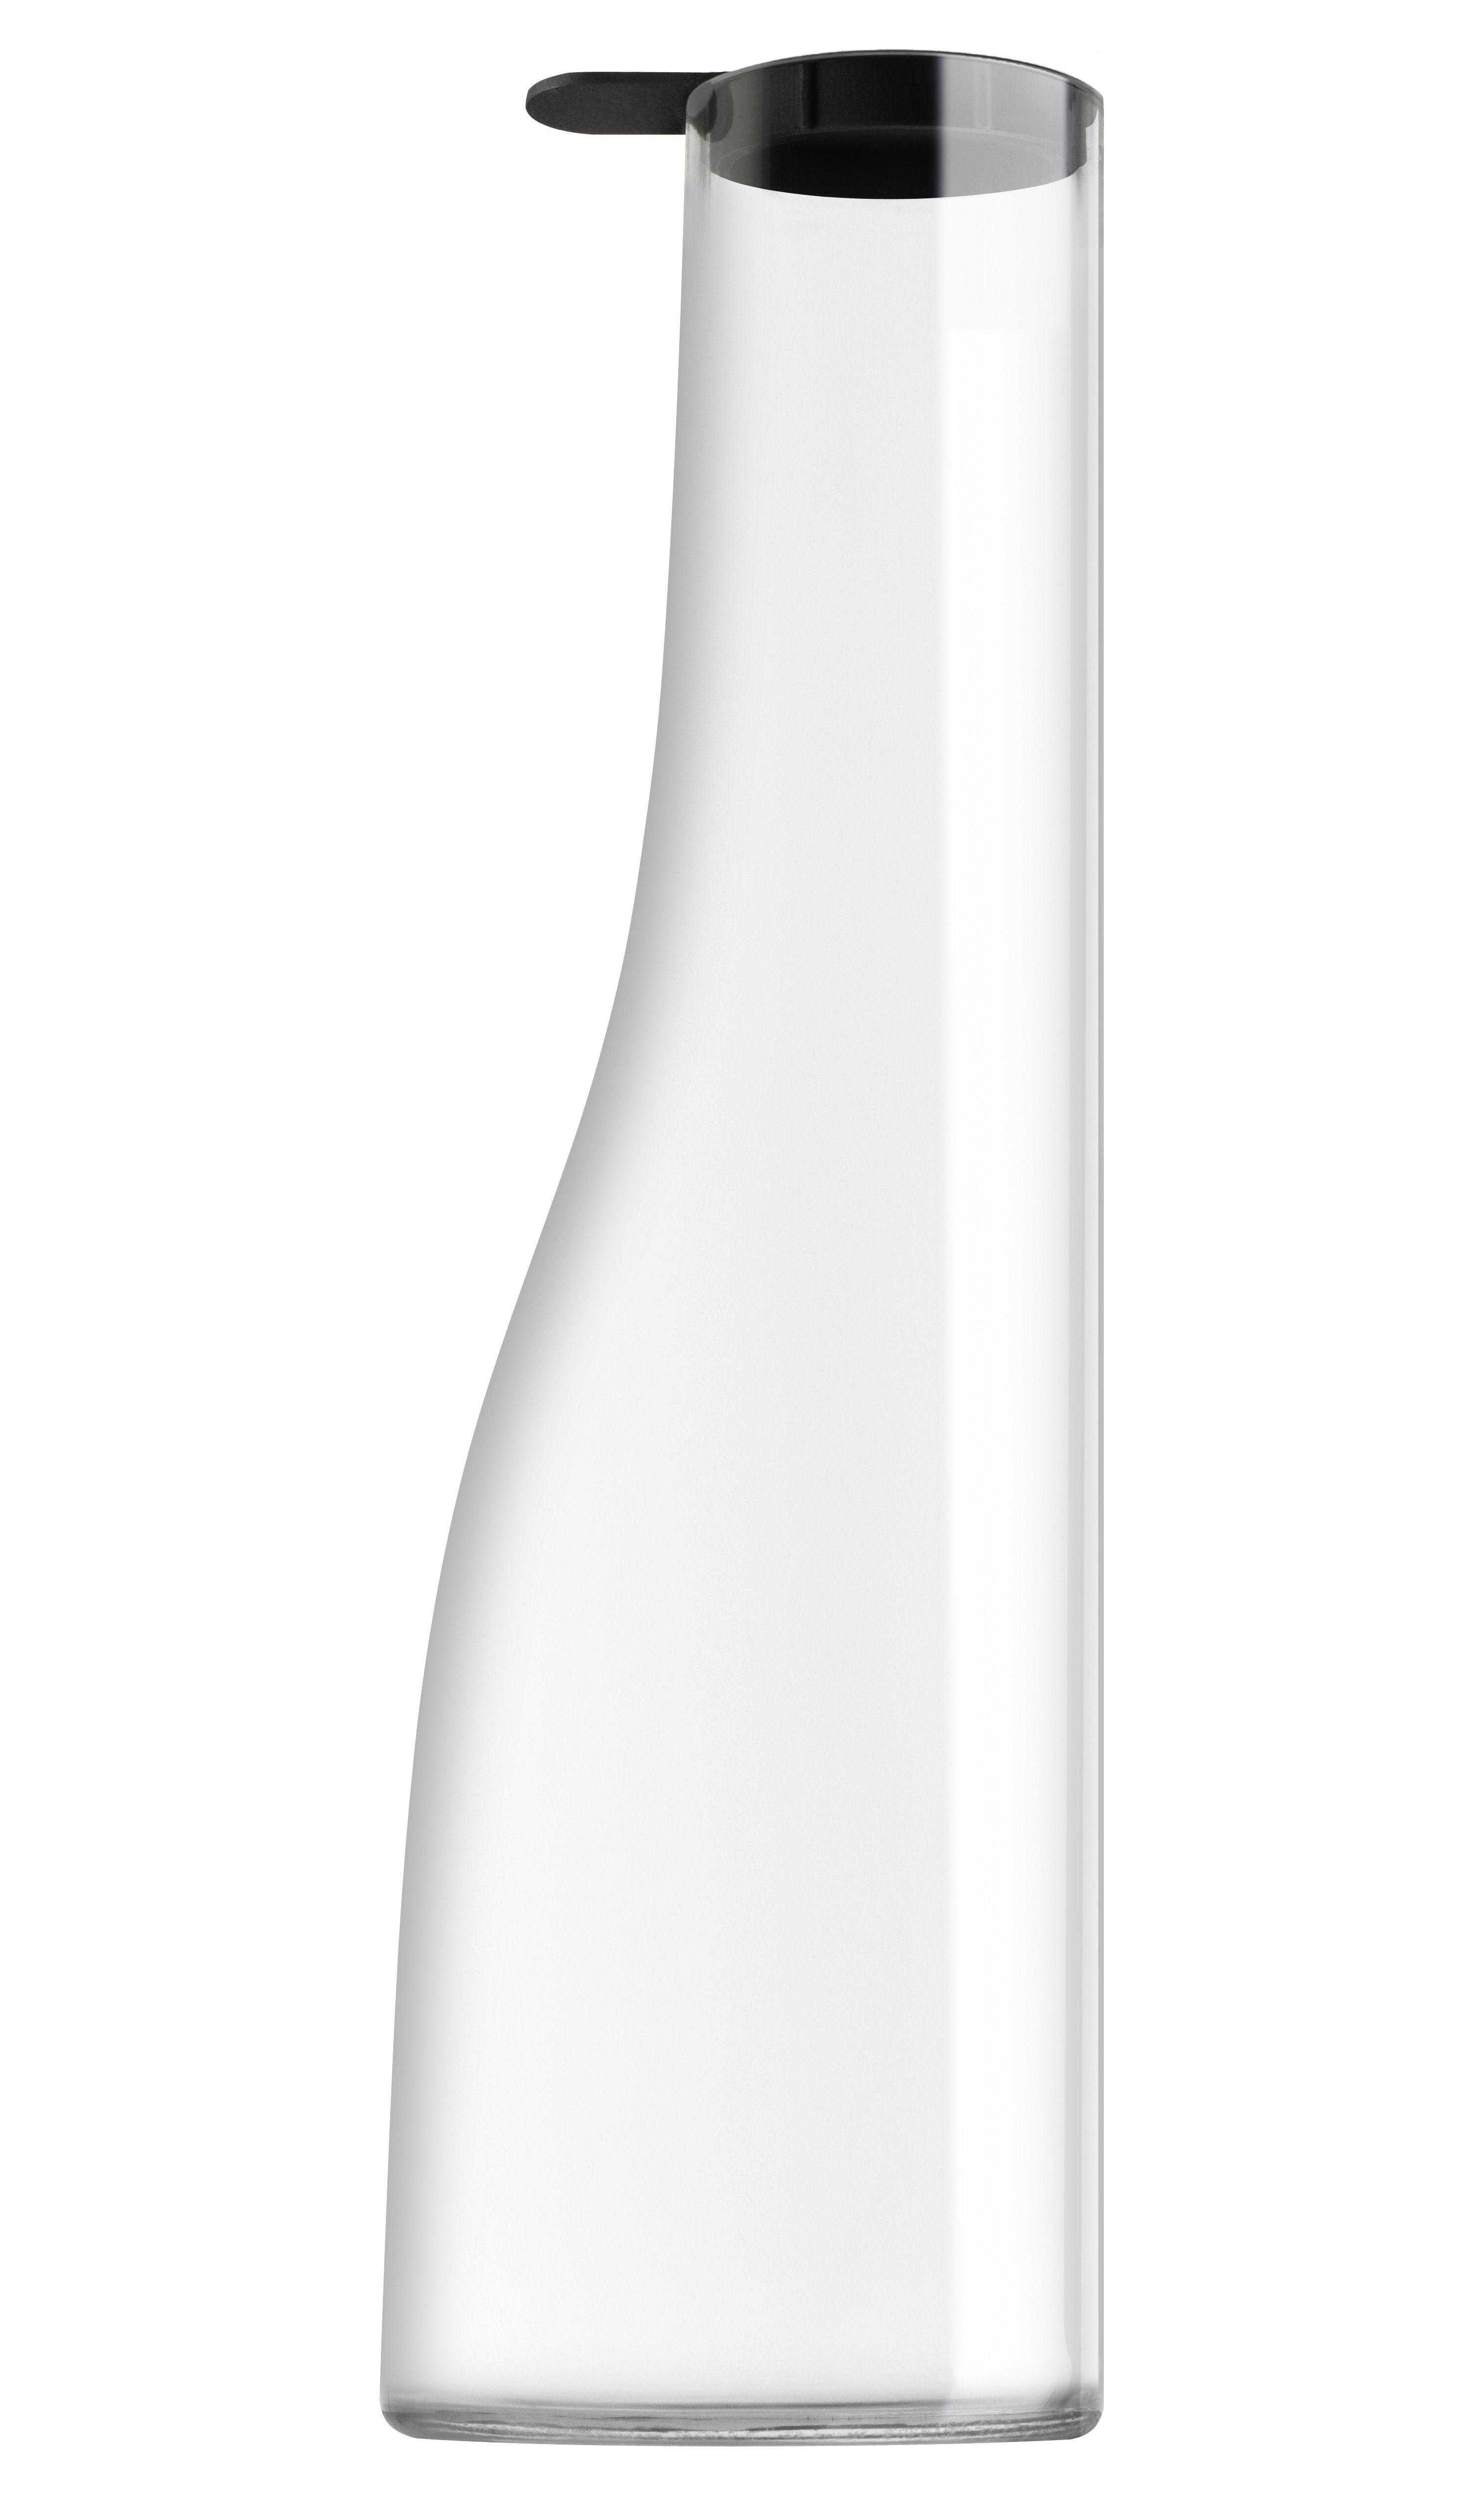 Tischkultur - Karaffen - Vas Karaffe - Italesse - Transparent - Glas, Plastik